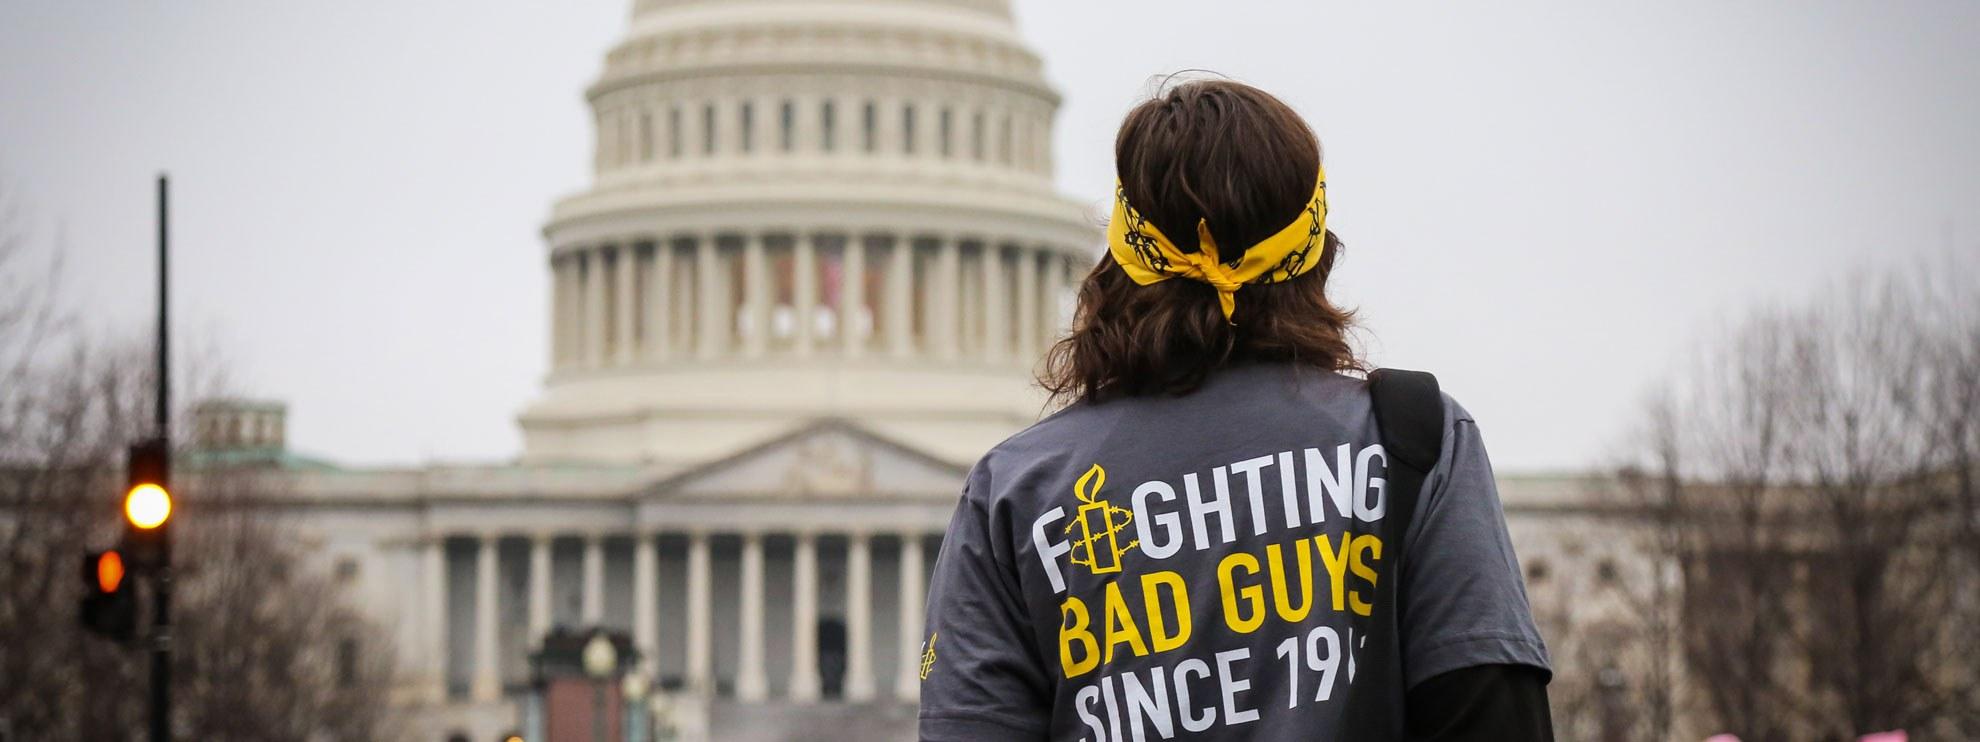 Women's March in Washington, 21. Januar 2017. © Amnesty International USA